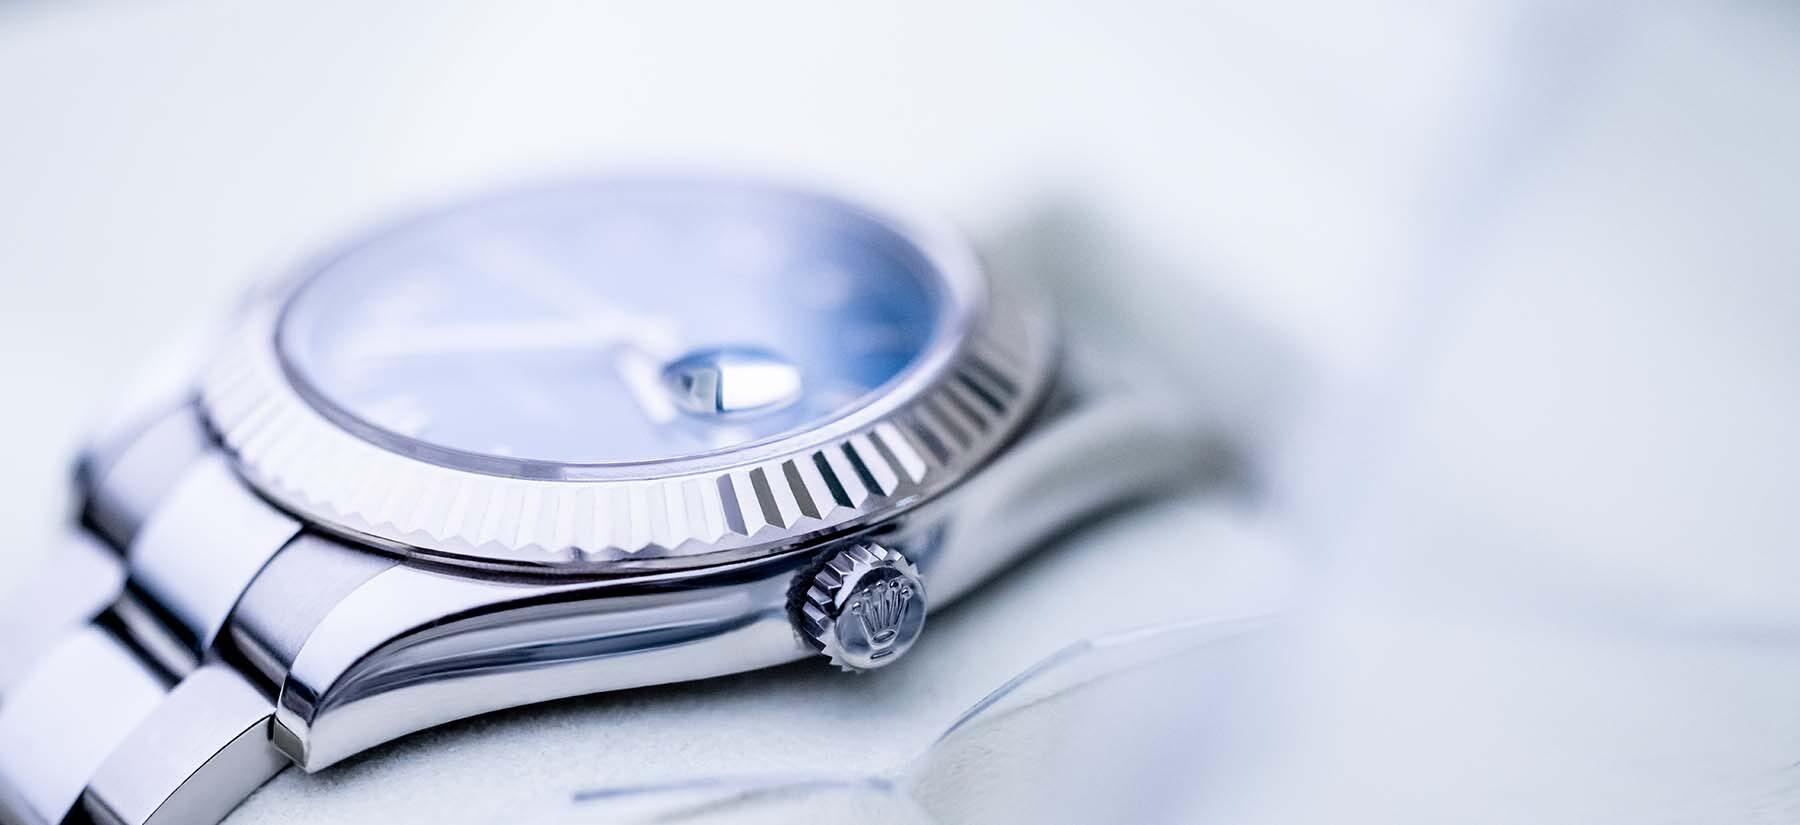 Uhrenindustrie-1-aspect-ratio-1800-825